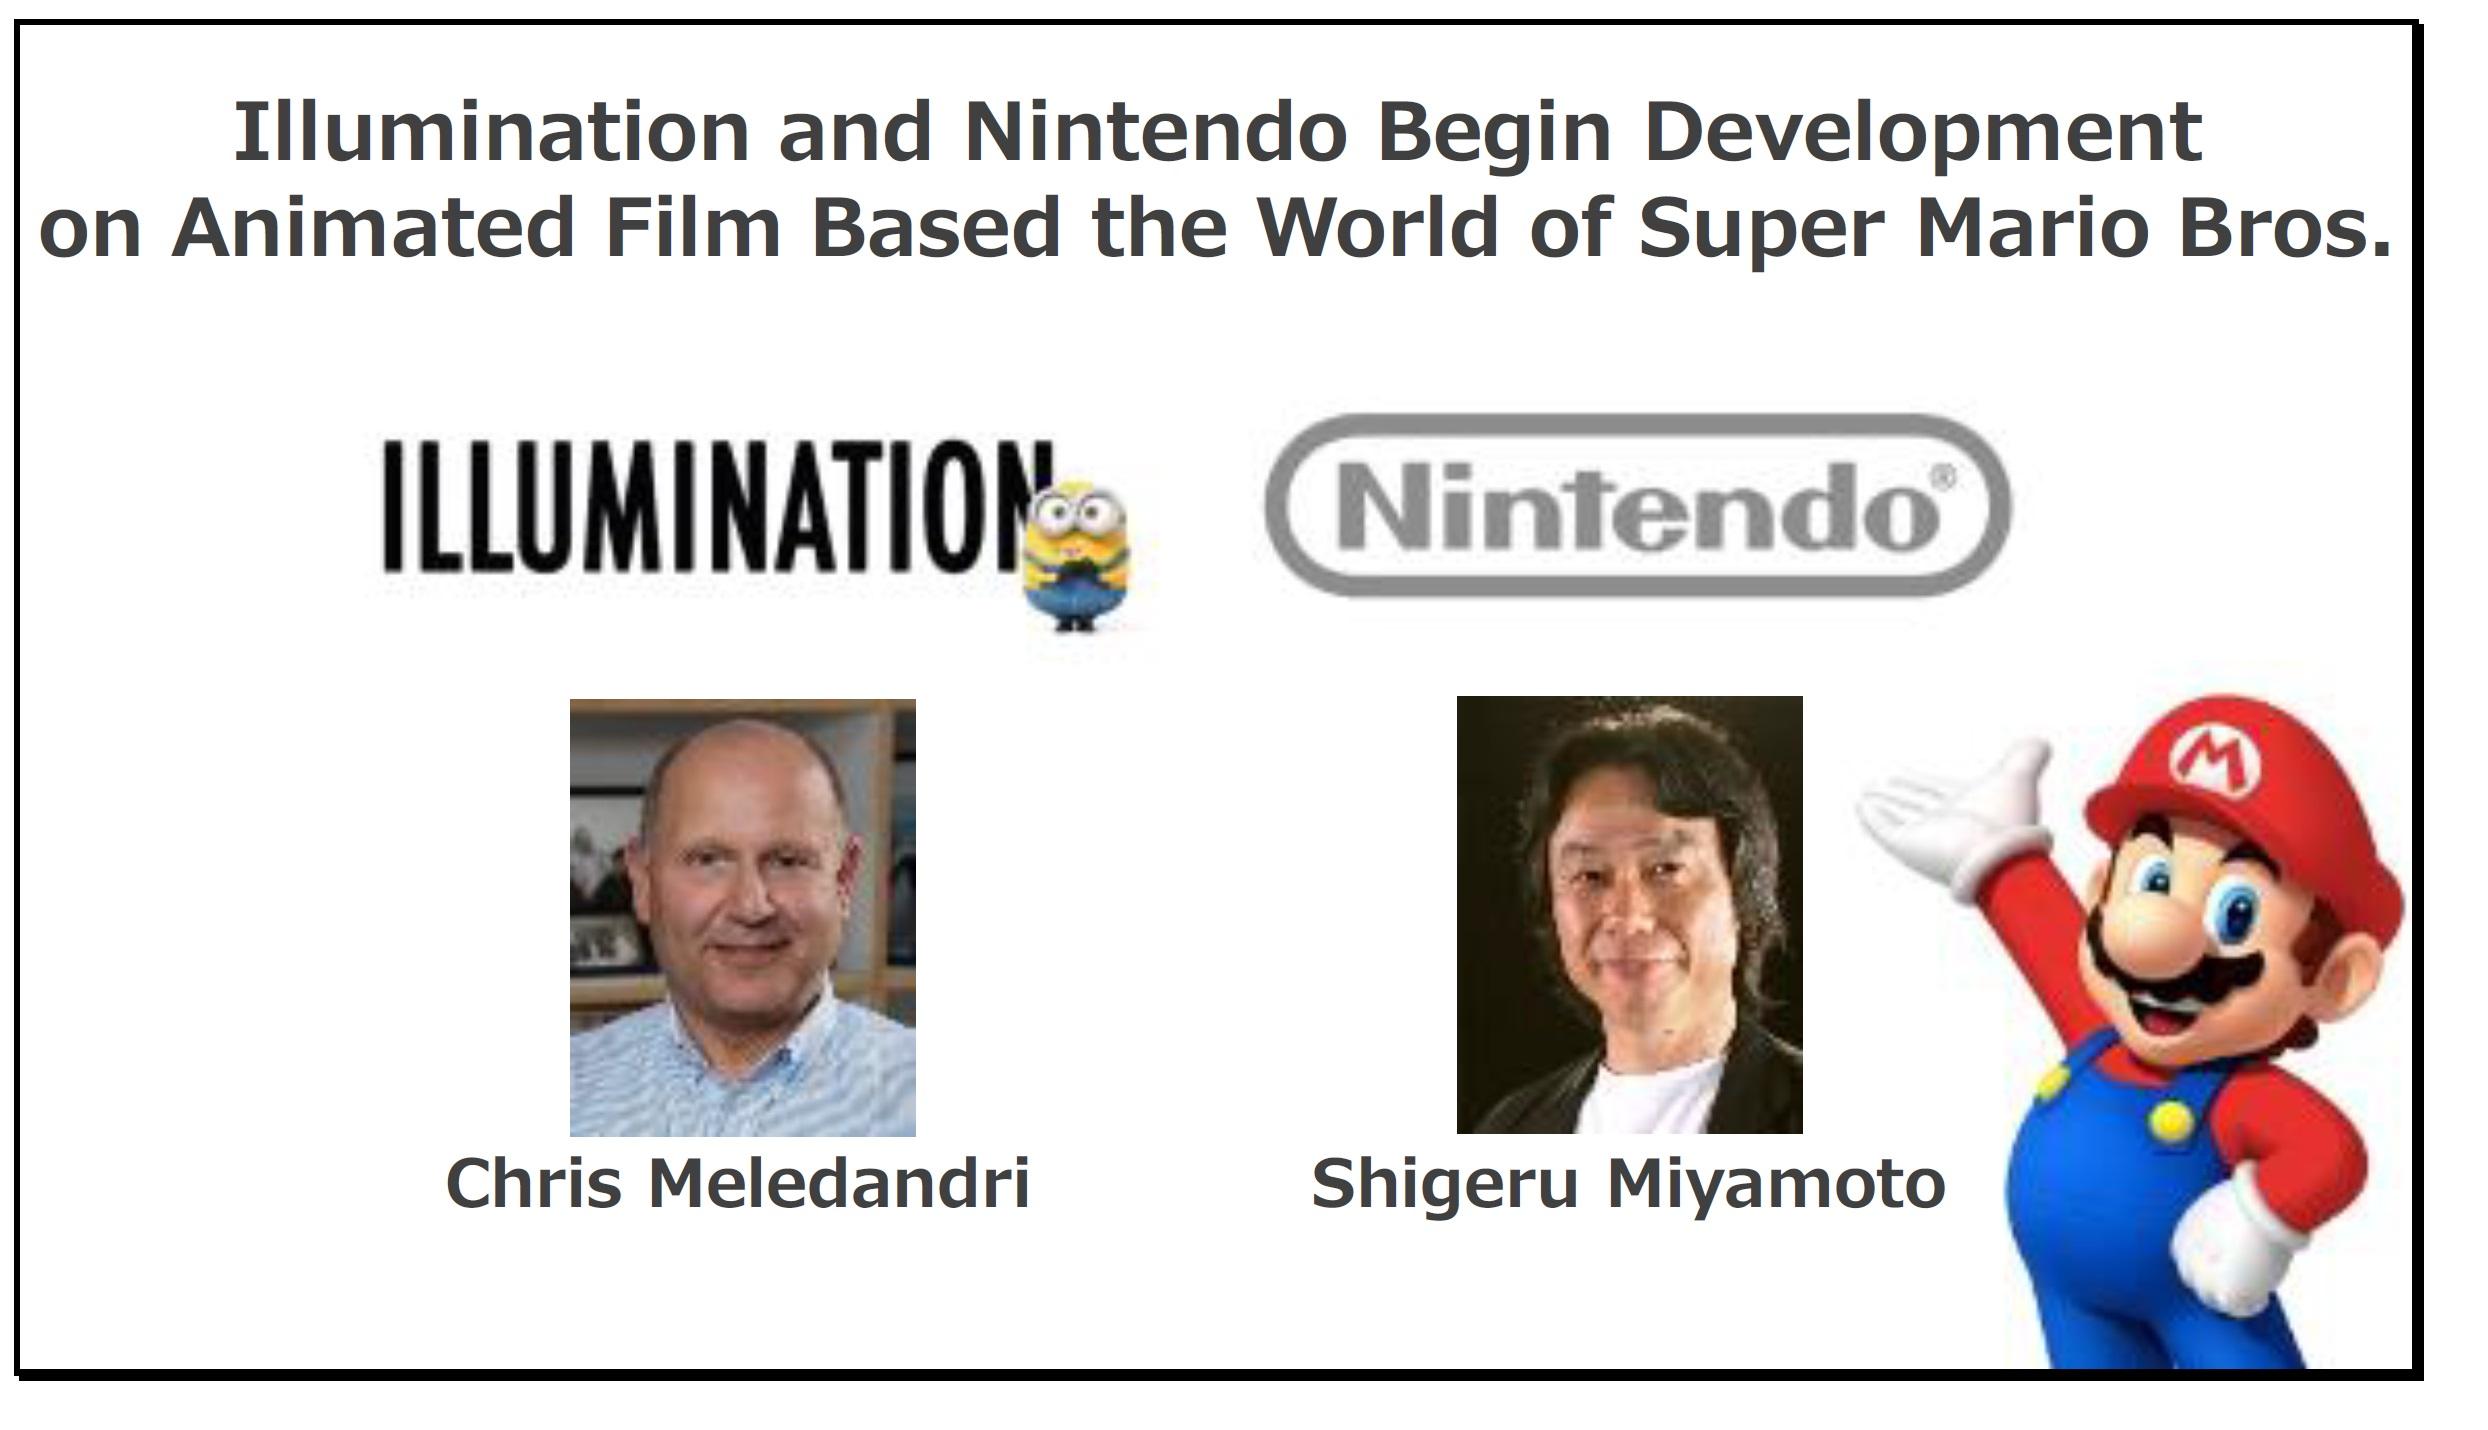 Illumination Artists Working On Super Mario Bros Animated Movie